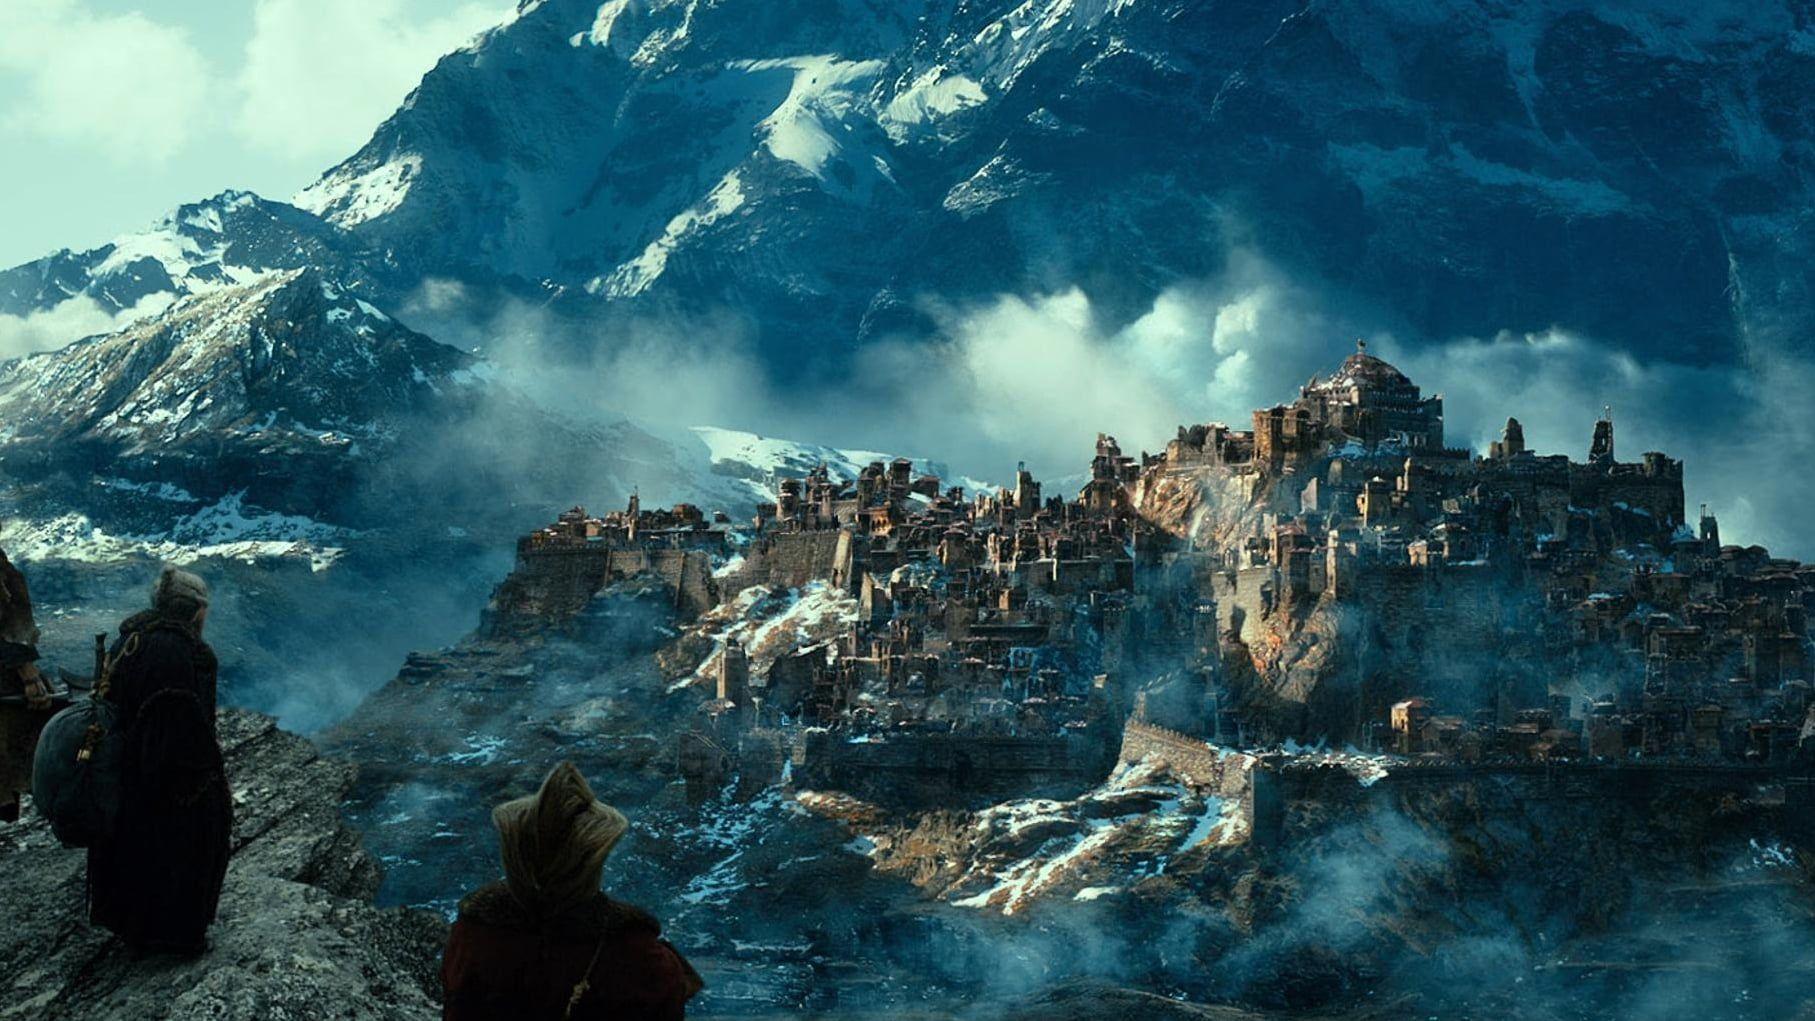 A Hobbit Smaug Pusztasaga 2013 Teljes Film Magyarul Online Hd Hu Mozi A Hobbit Smaug Pusztasaga 2013 Teljes Film Magyarul O Gandalv Hobbiten Trollmann